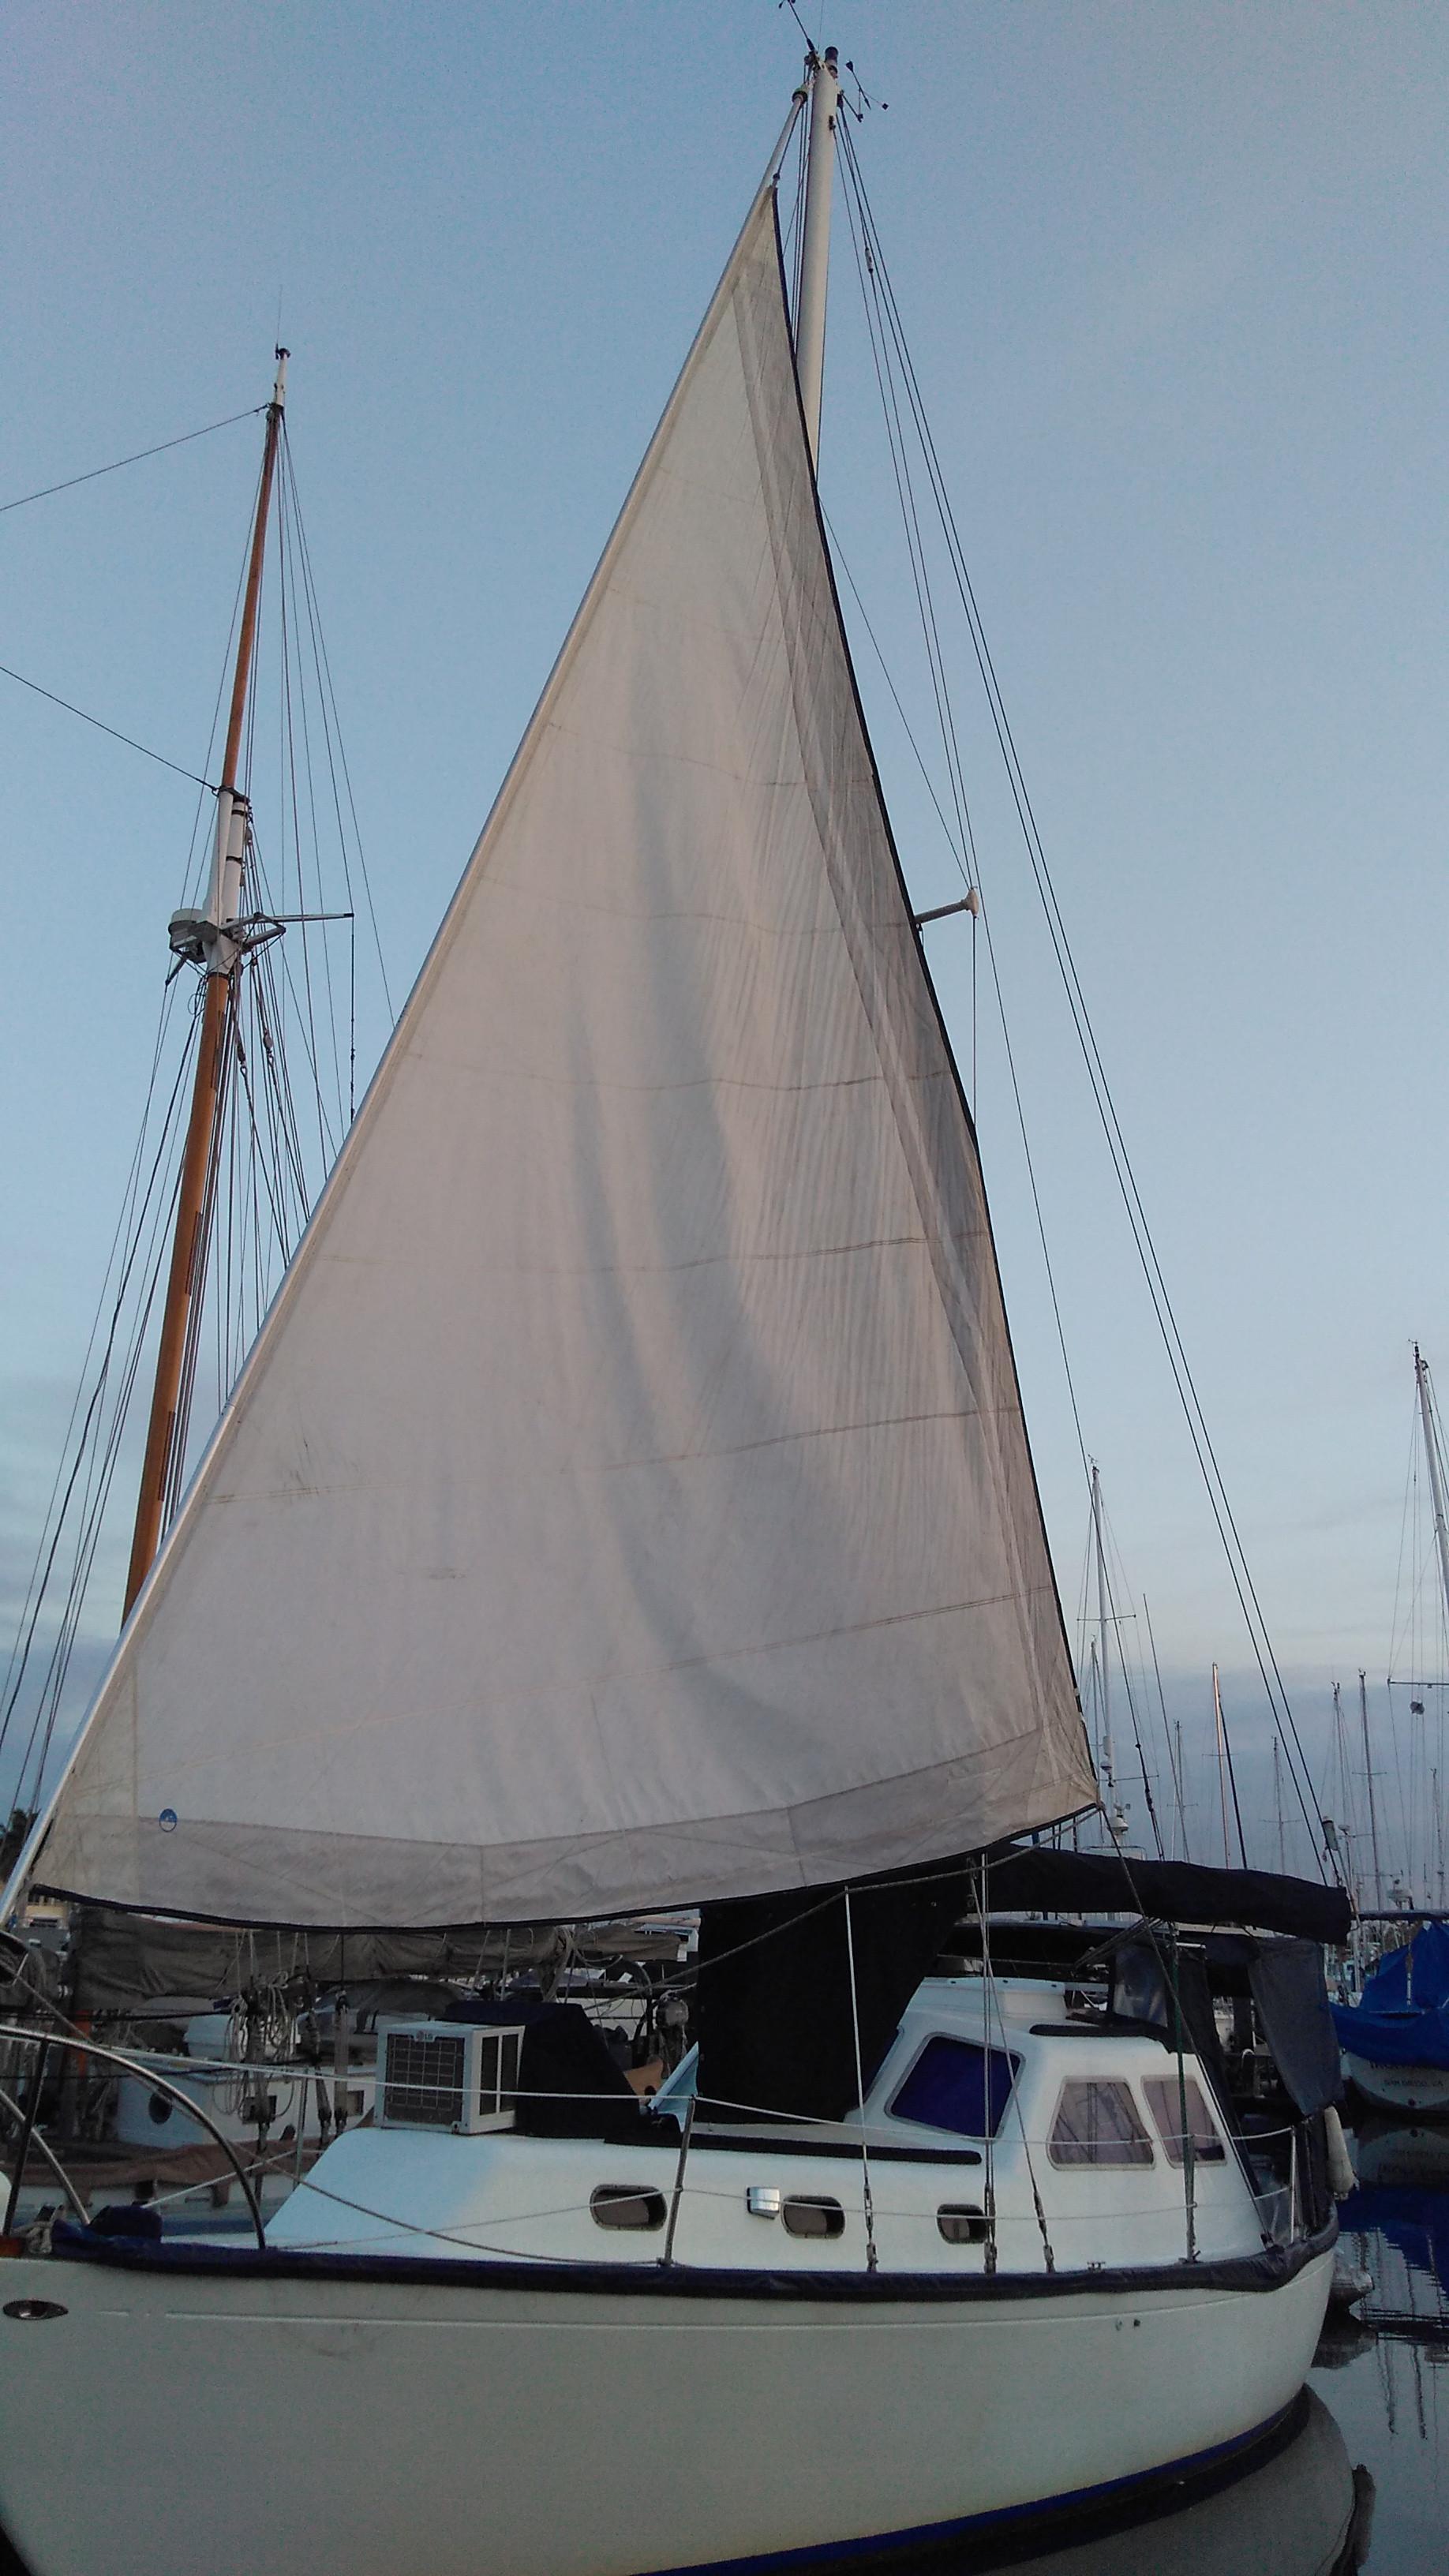 37' Islander 37 MS+Boat for sale!